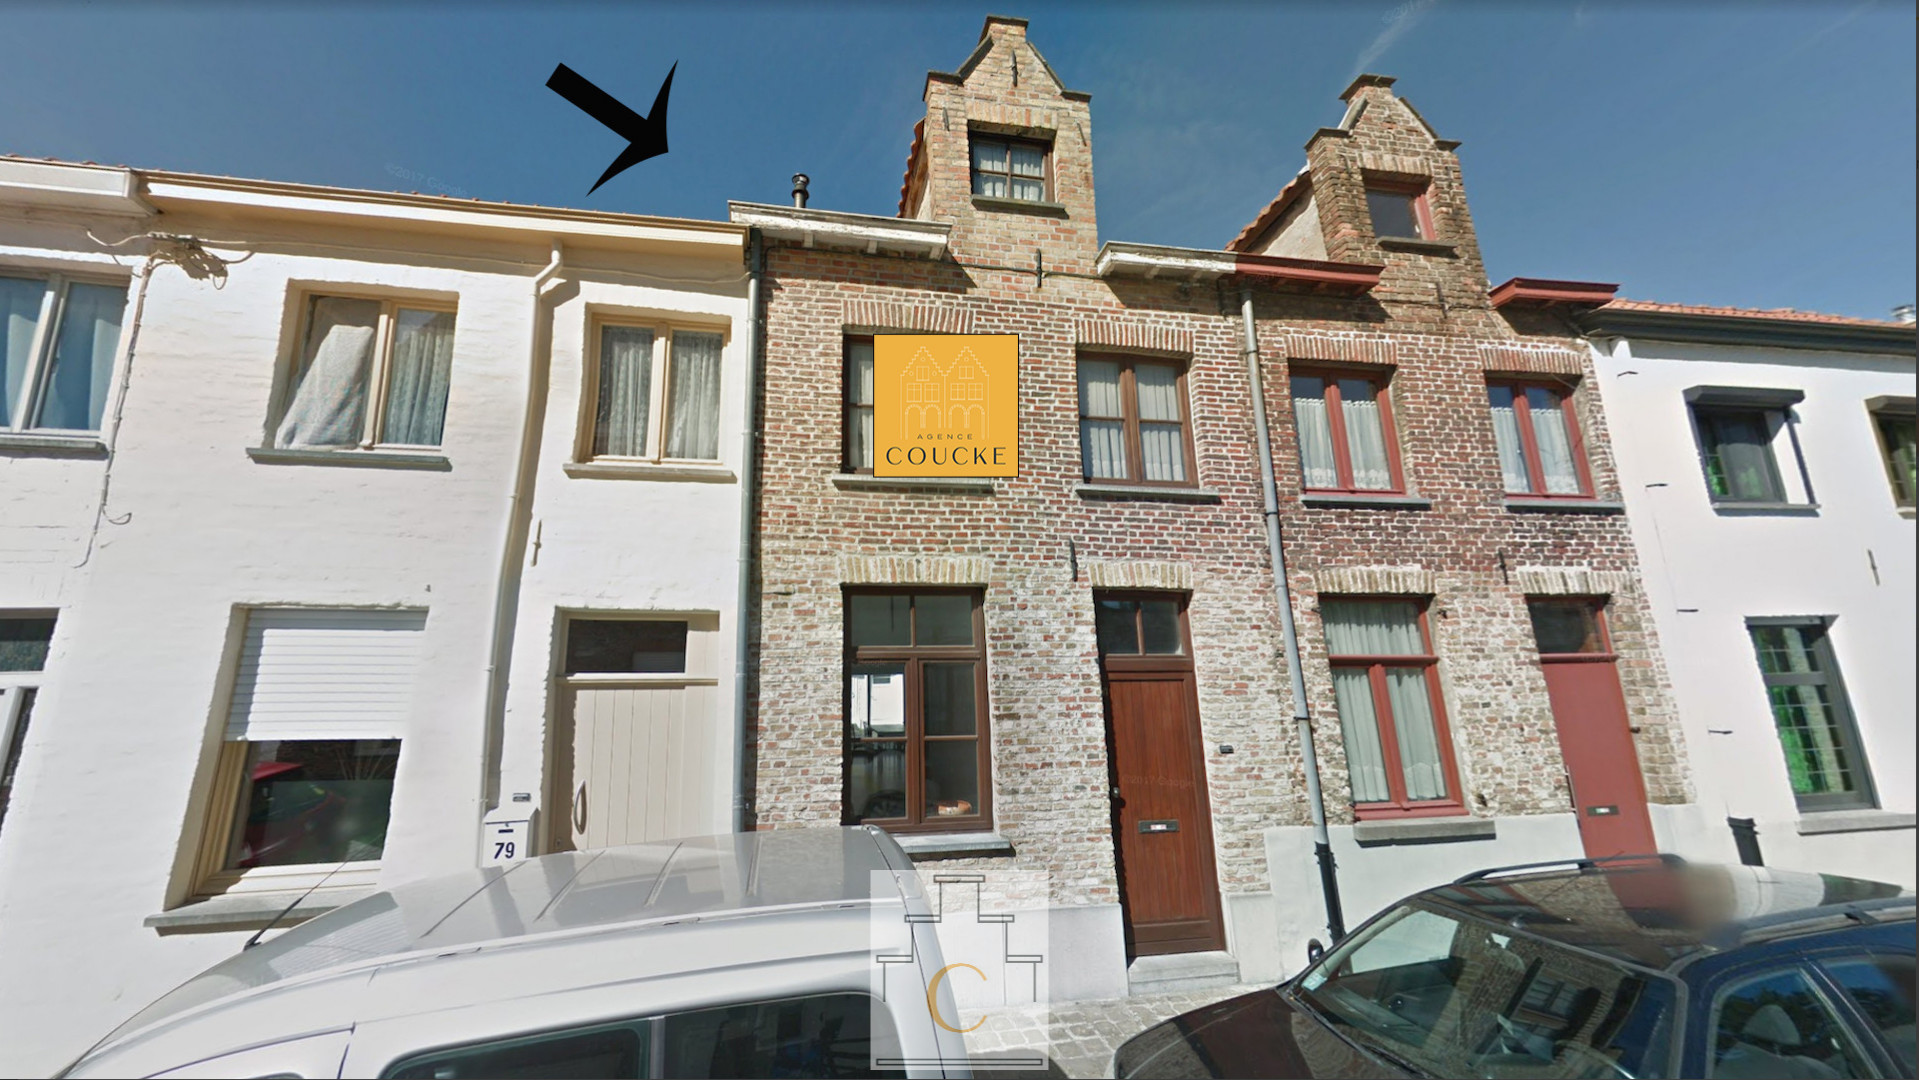 Leuk huis met terras hartje Brugge - 2 slpk